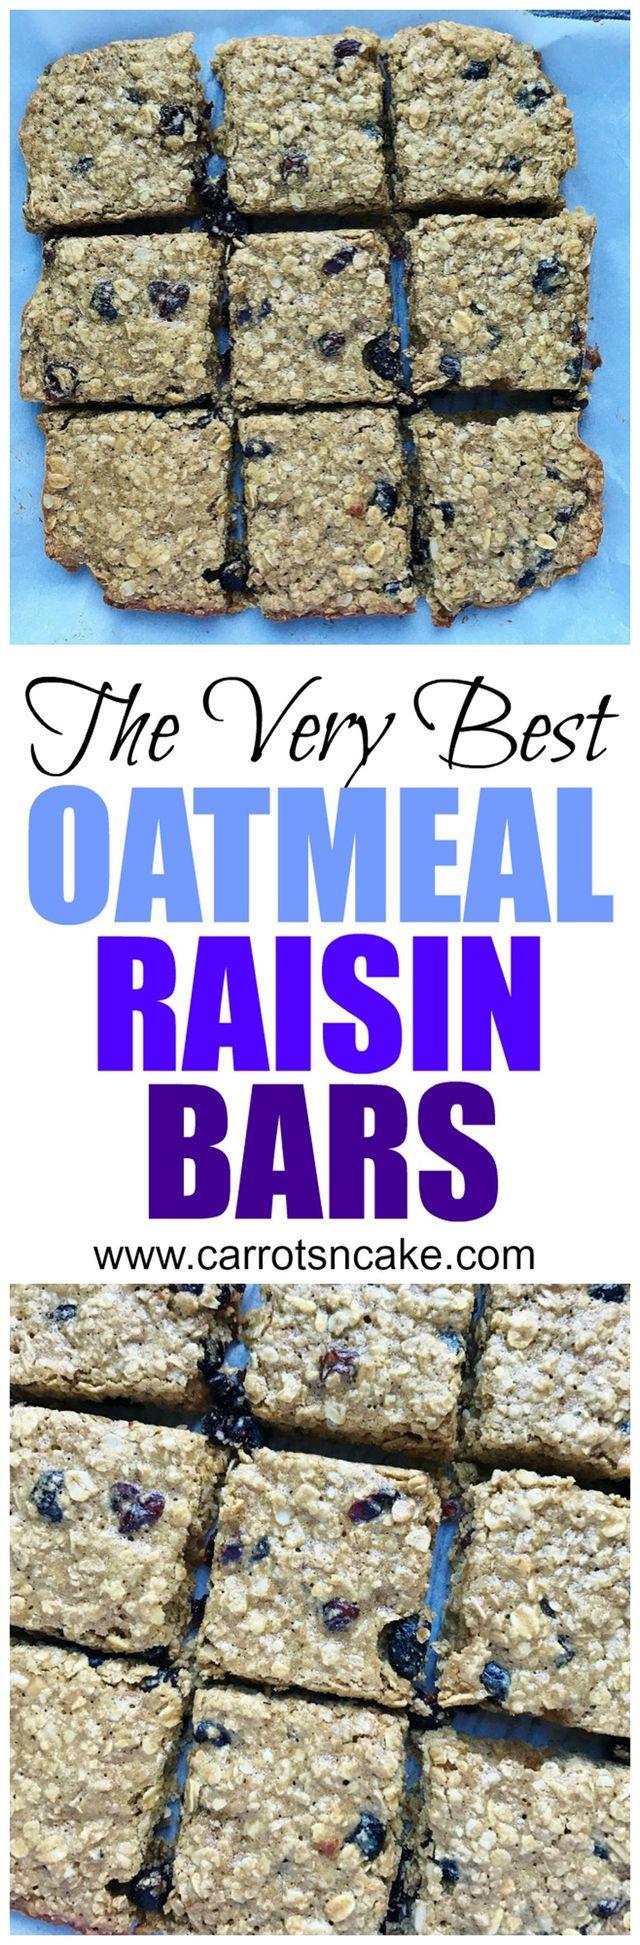 The Very Best Oatmeal Raisin Bars